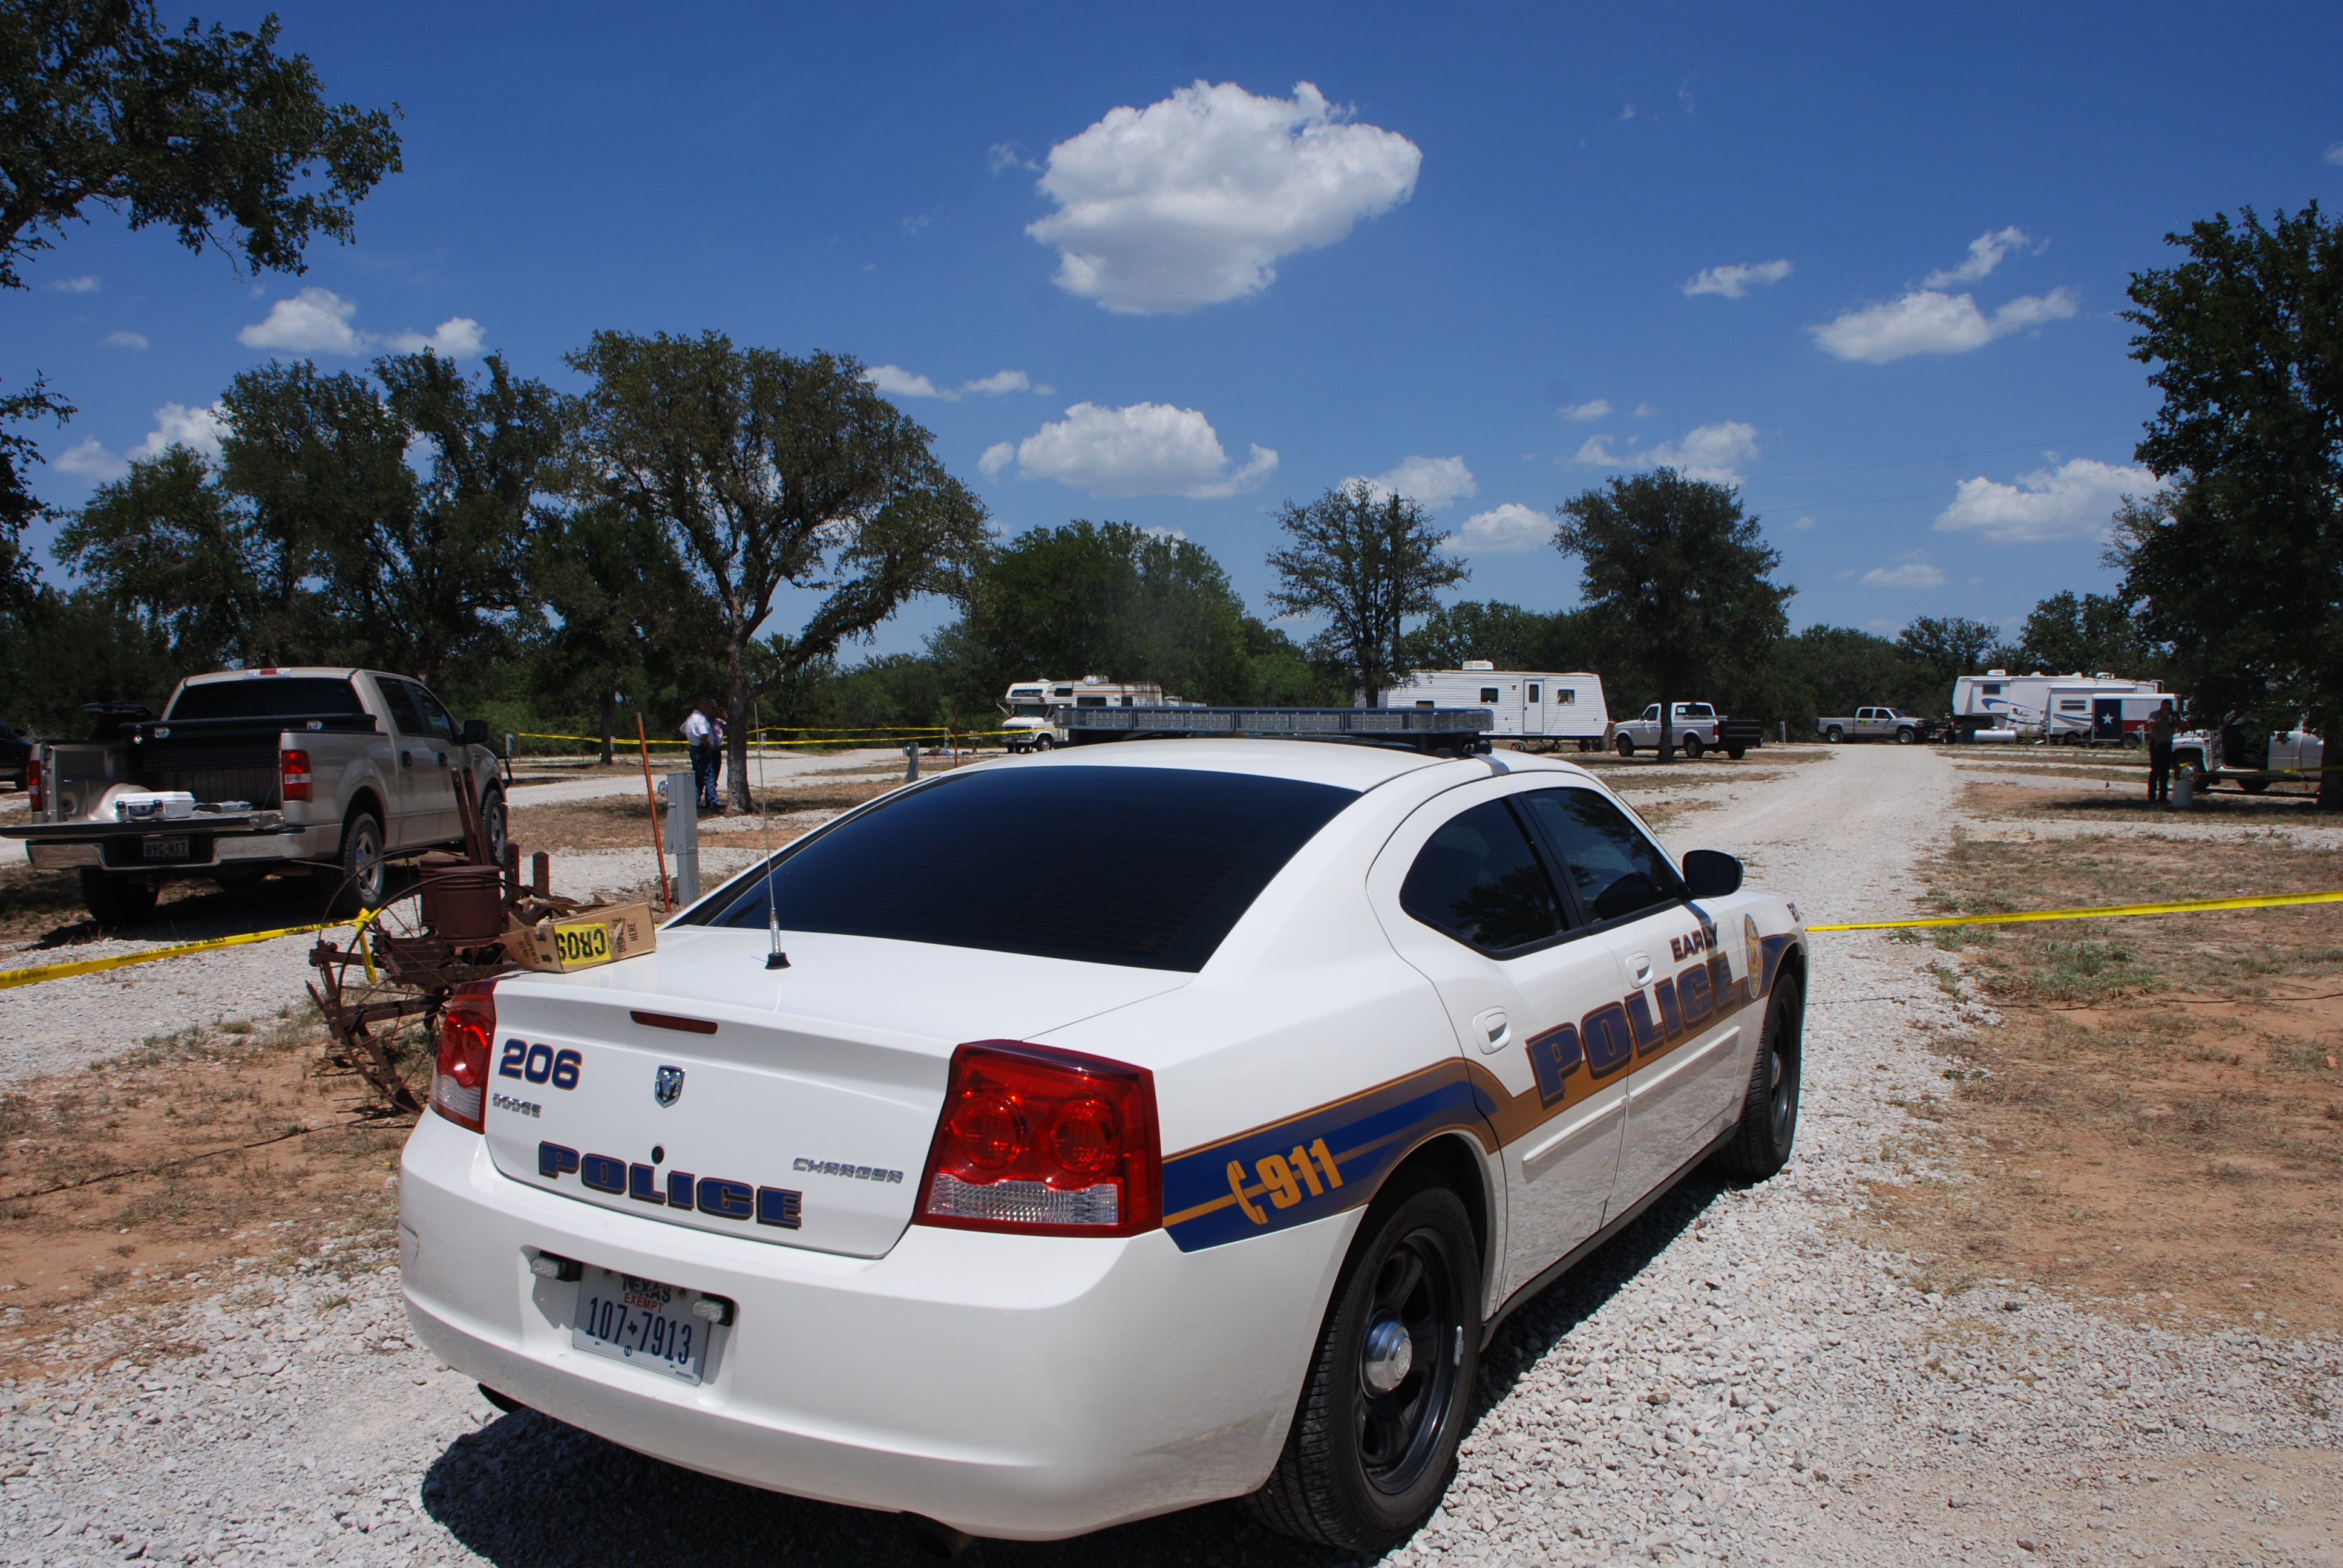 Shots Fired: Brown County, Texas Crime Scene Photos